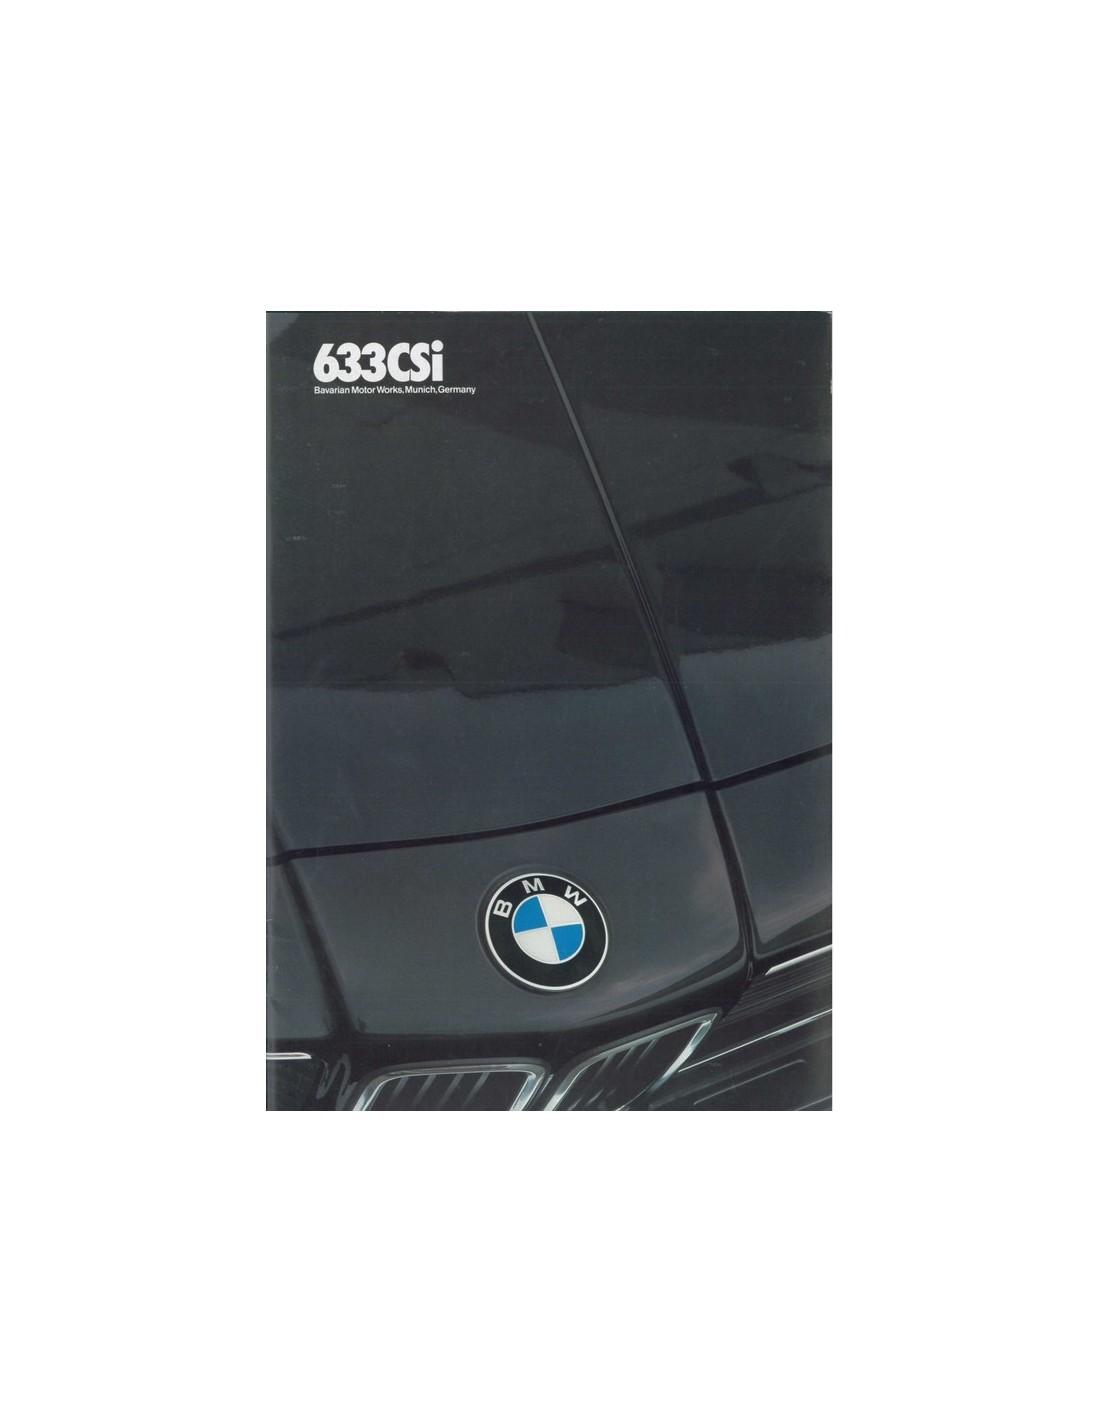 Bmw Z3 Brochure: 1983 BMW 6 SERIE BROCHURE ENGELS USA